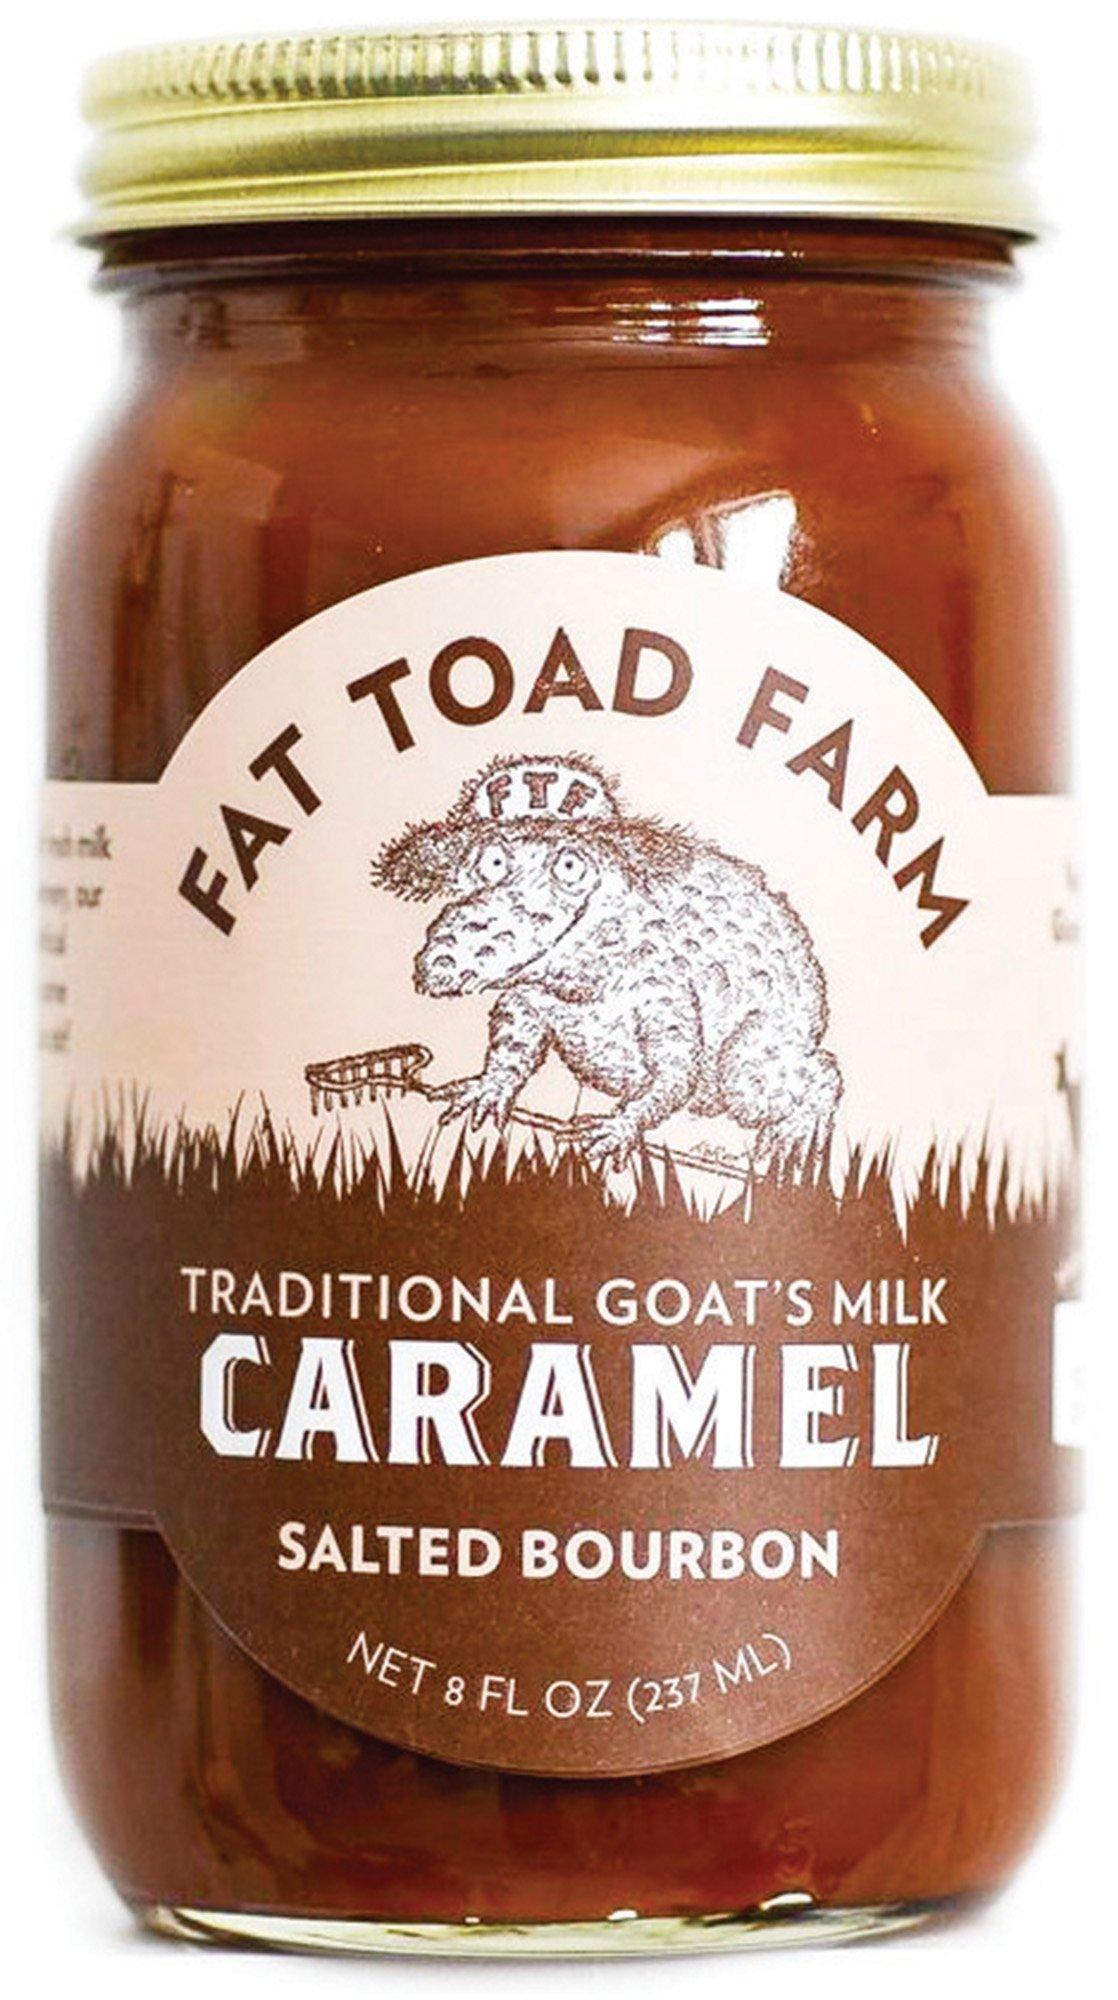 Fat Toad Farm Traditional Goats Milk Caramel Sauce, Salted Bourbon, 8fl oz Jar,